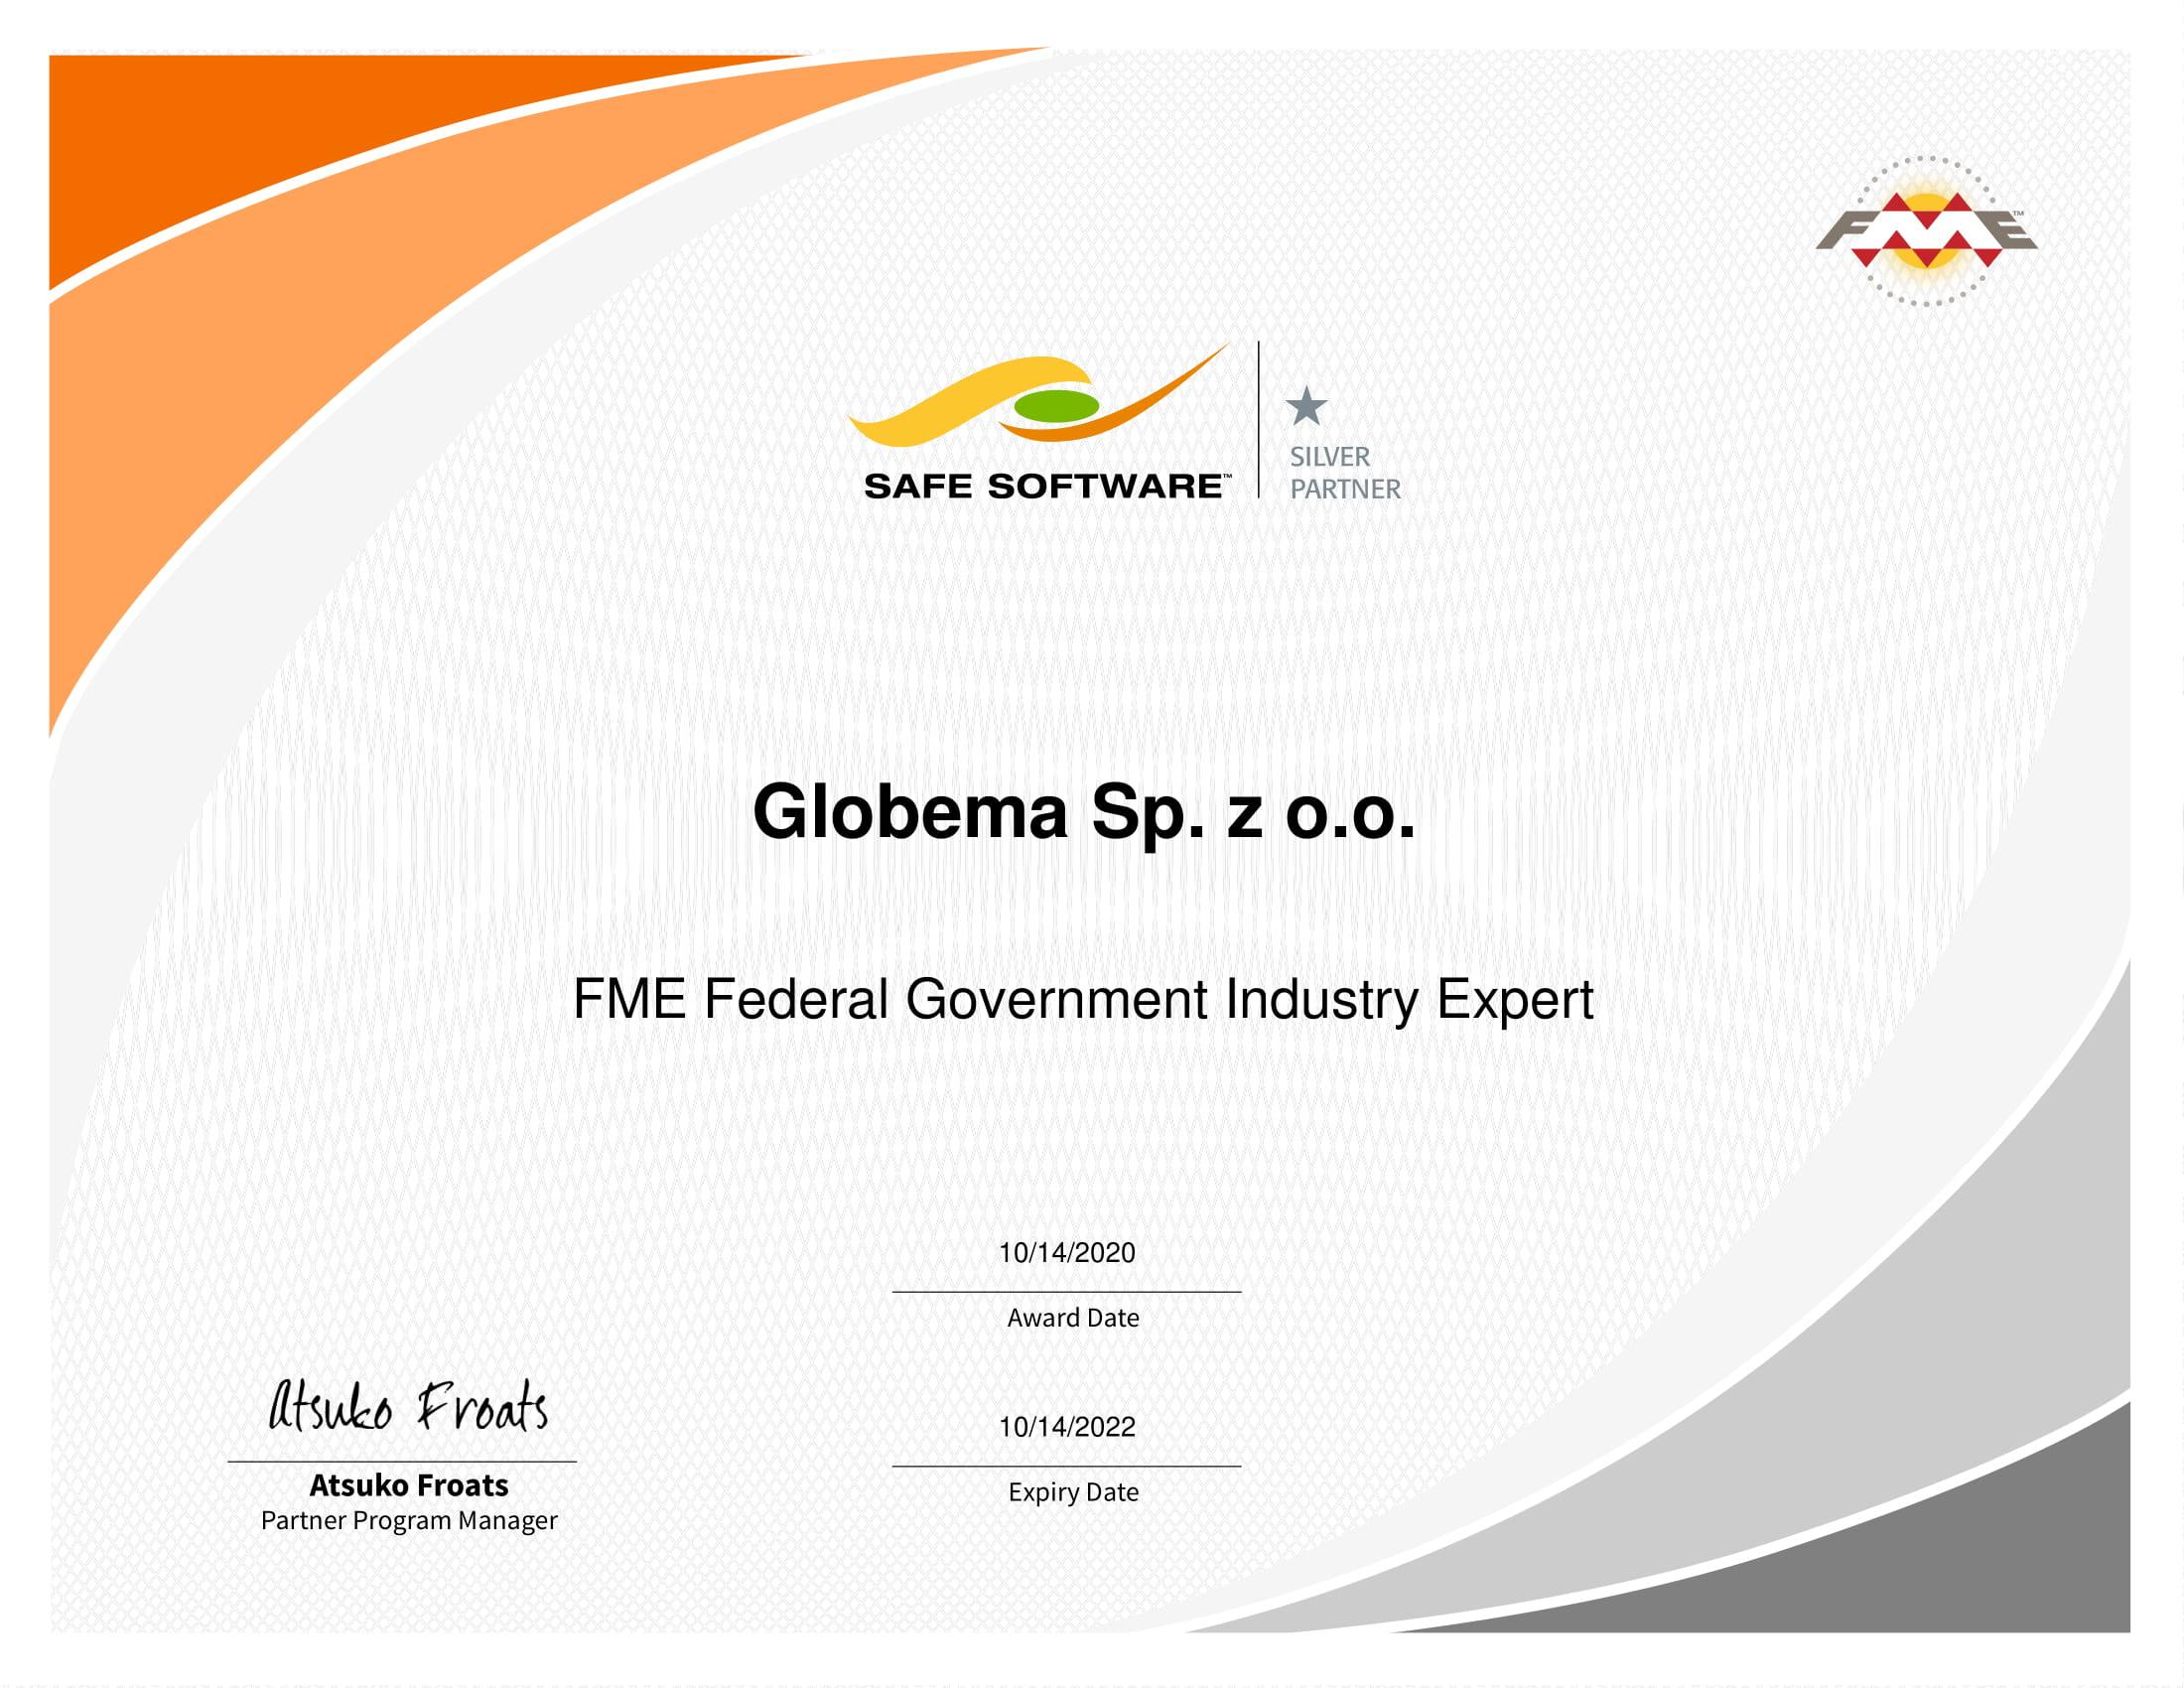 Globema Federal Central Government